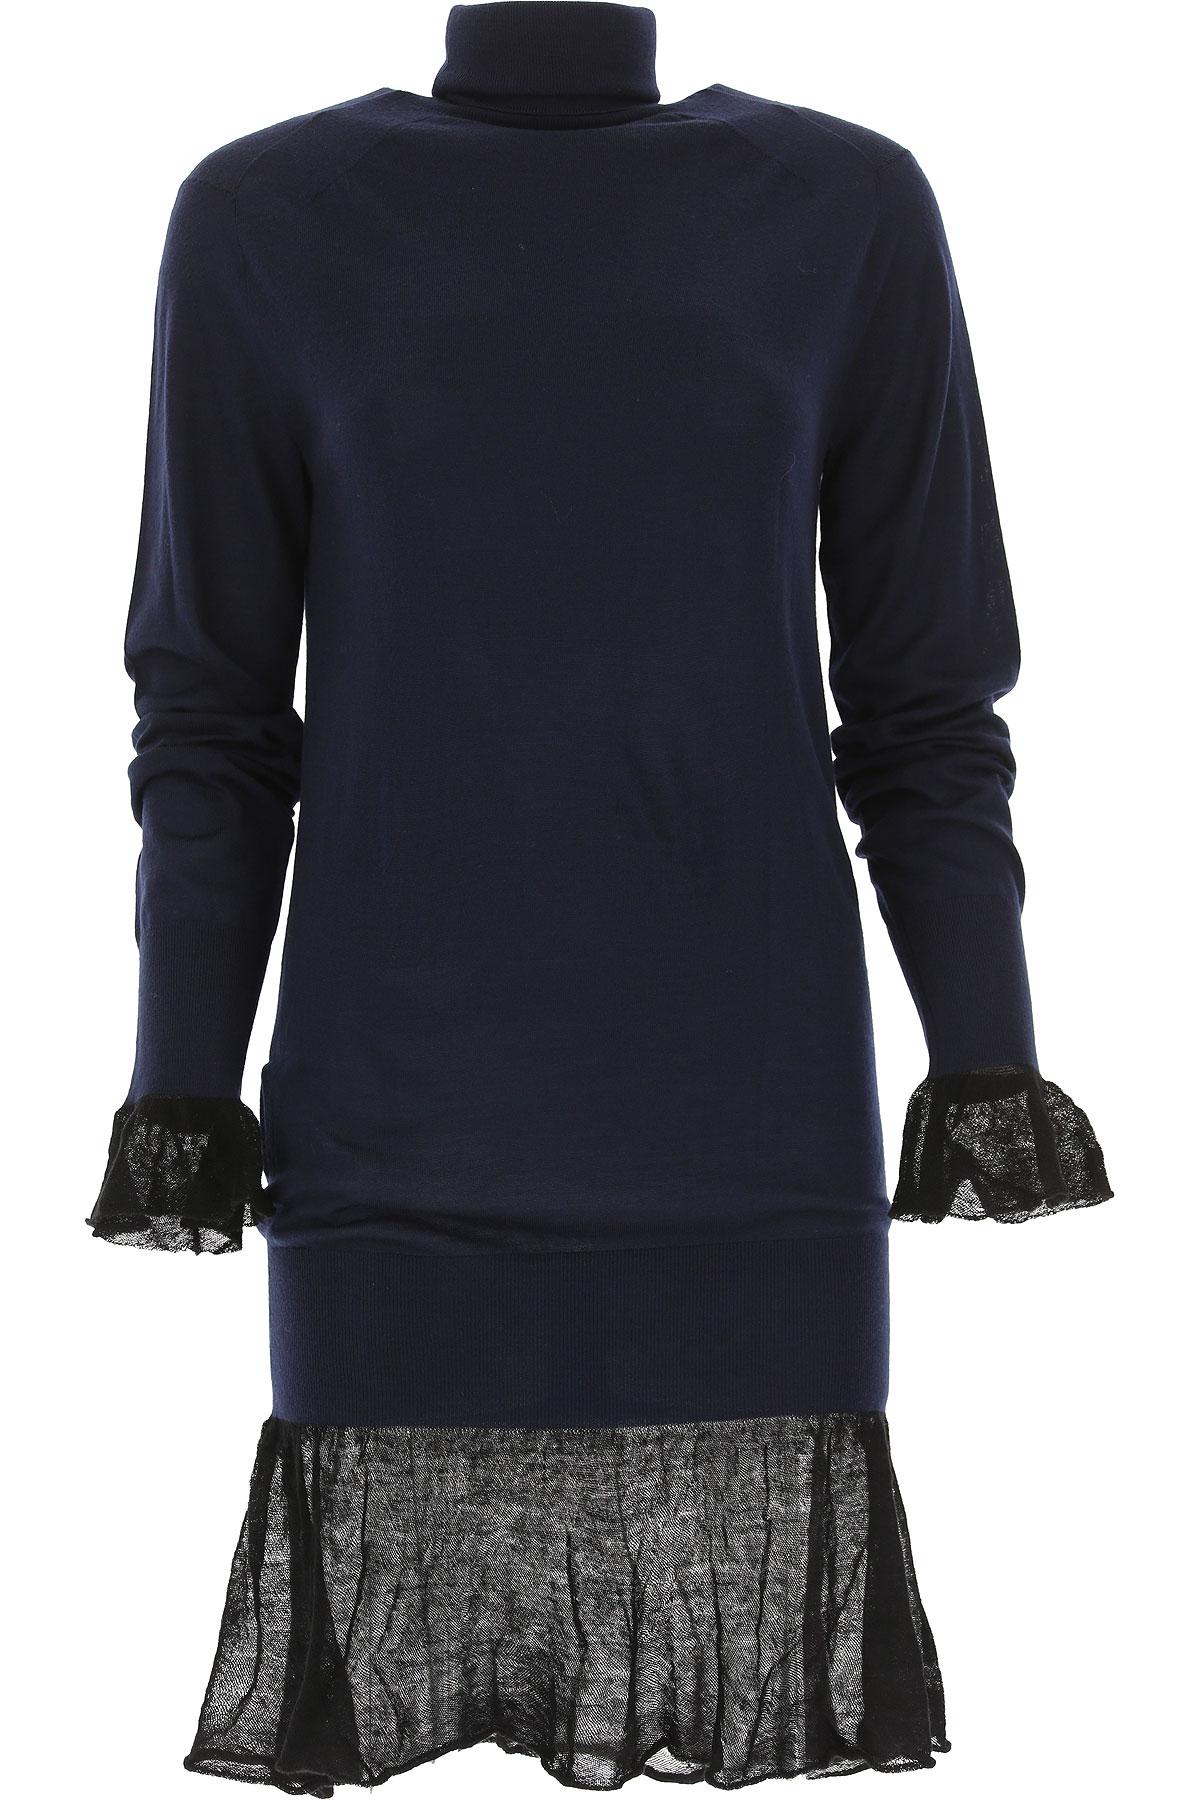 Image of Sacai Dress for Women, Evening Cocktail Party, Blue Navy, Wool, 2017, US 0 - UK 4 - EU 34 - IT 38 US 2 - UK 6 - EU 36 - IT 40 US 4 - UK 8 - EU 38 - IT 42